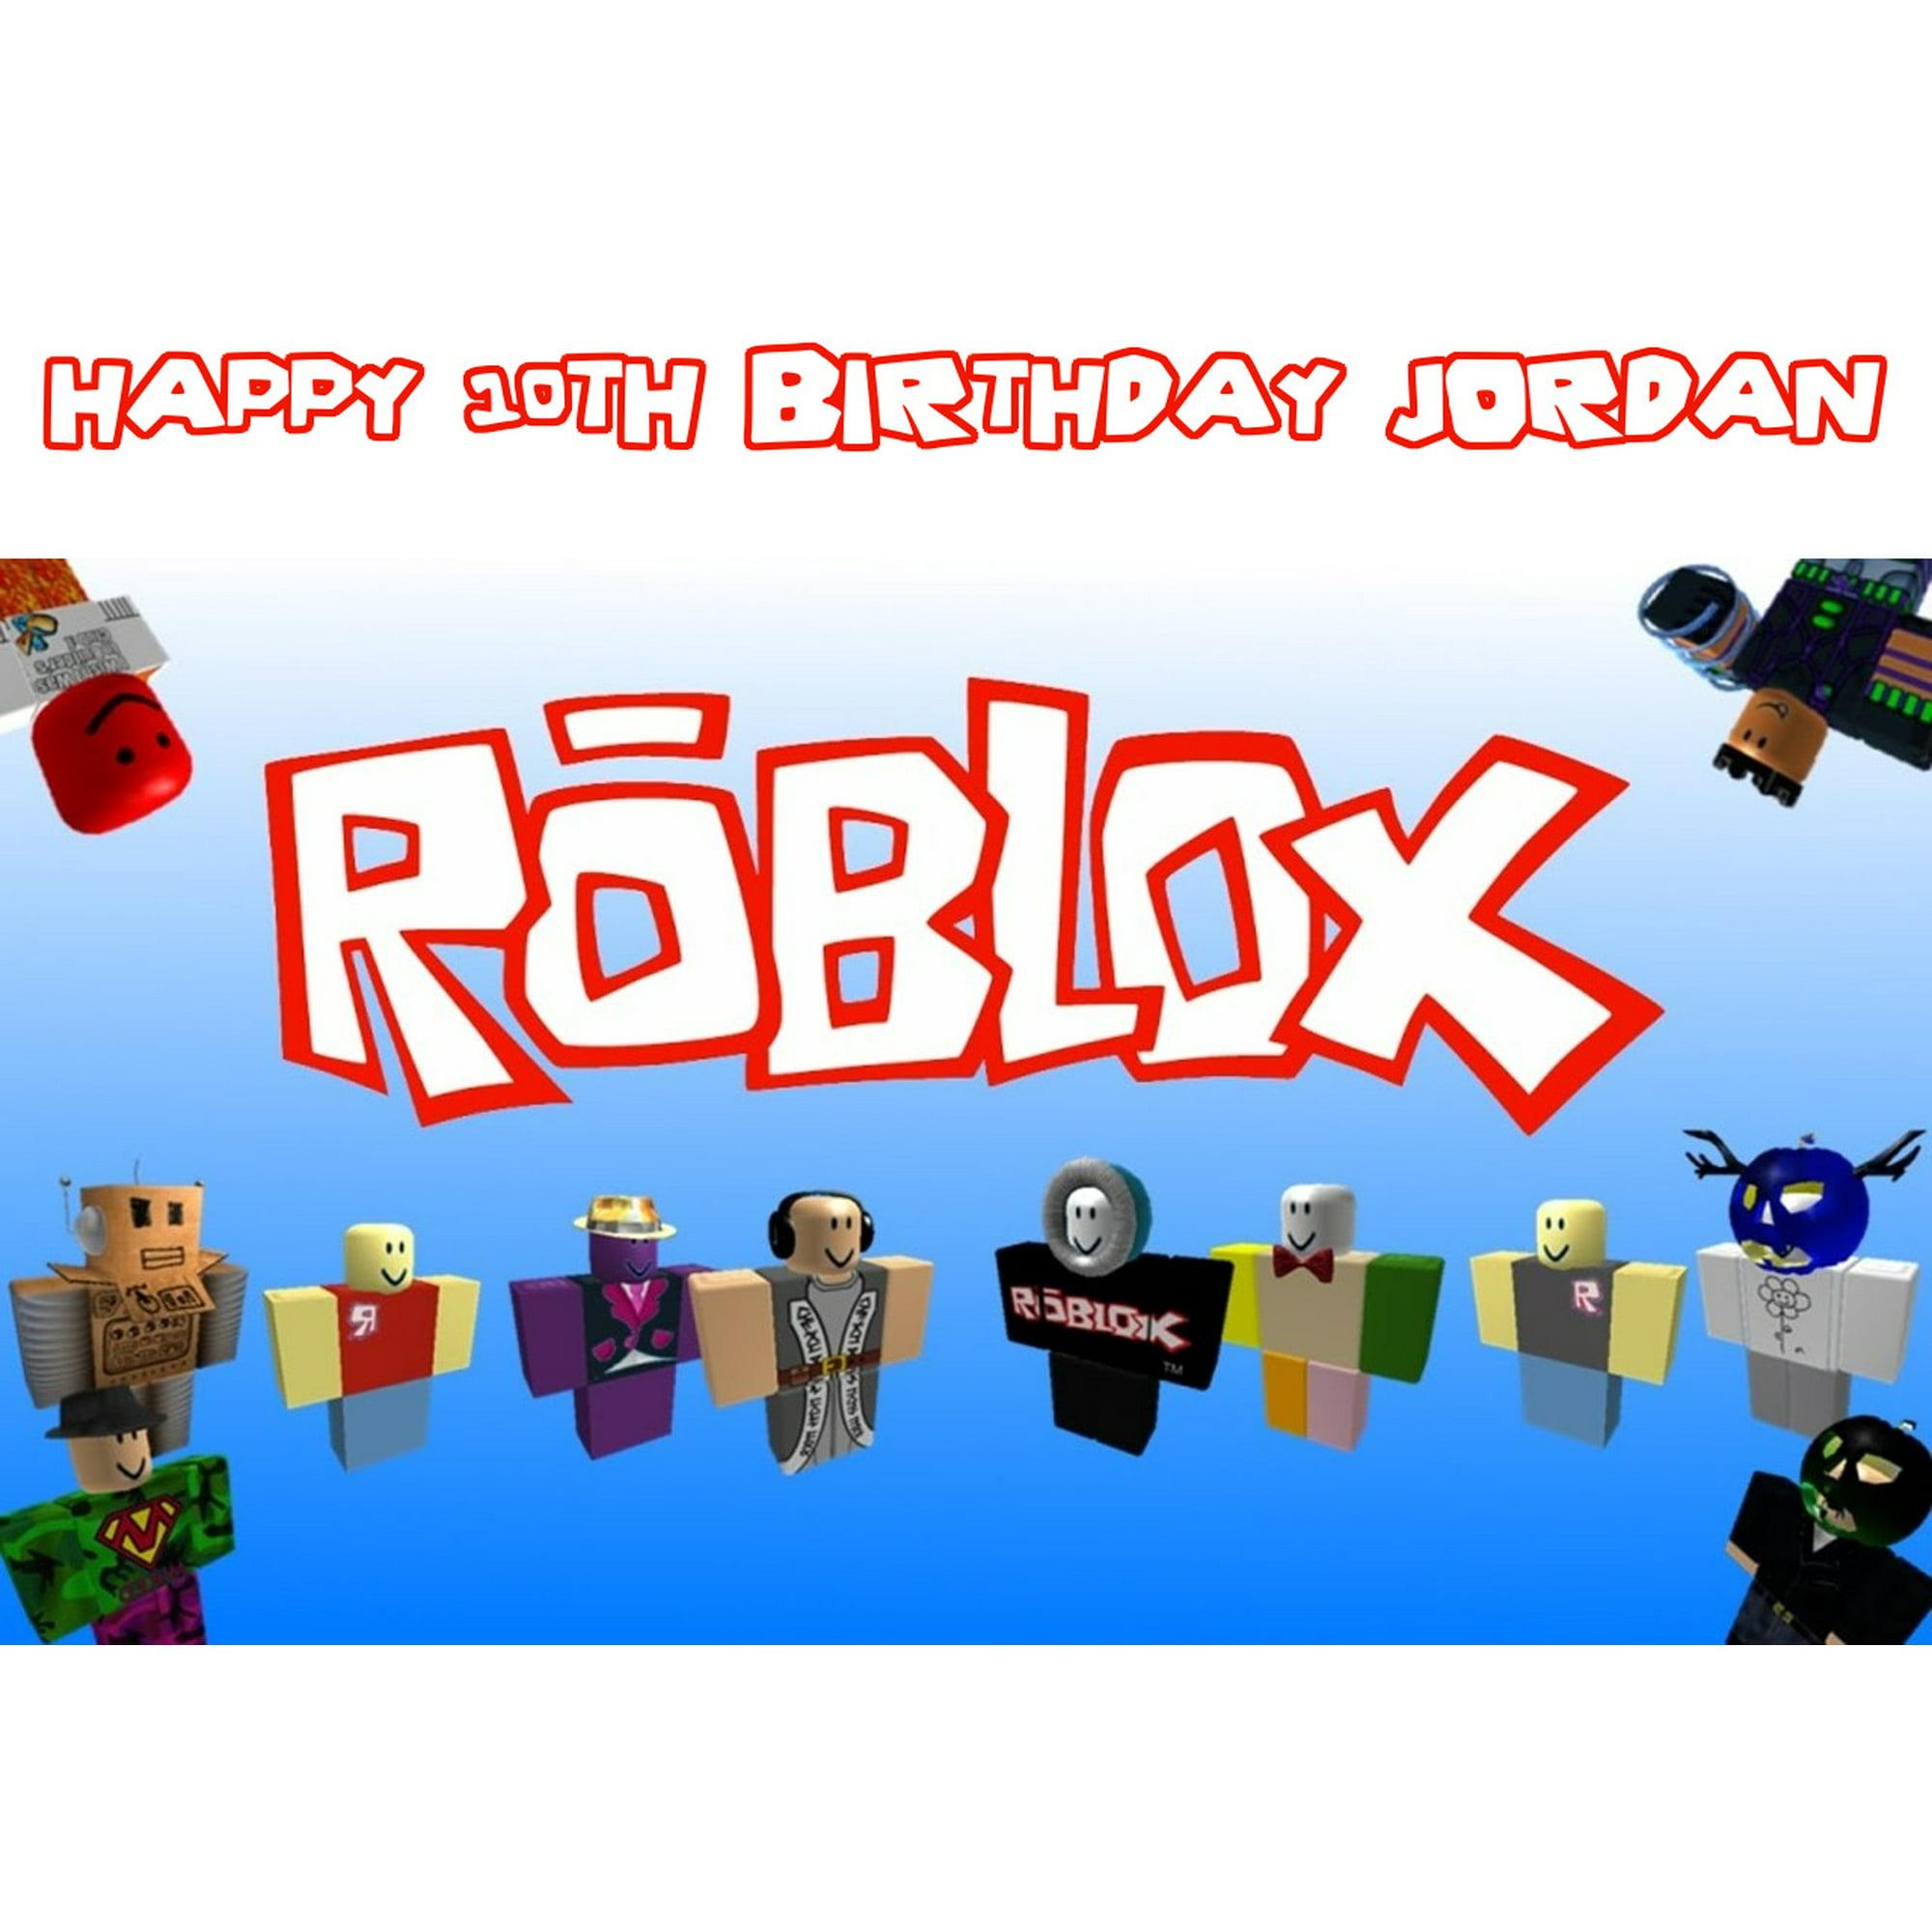 Roblox Custom Player Happy Birthday Edible Cake Topper Image